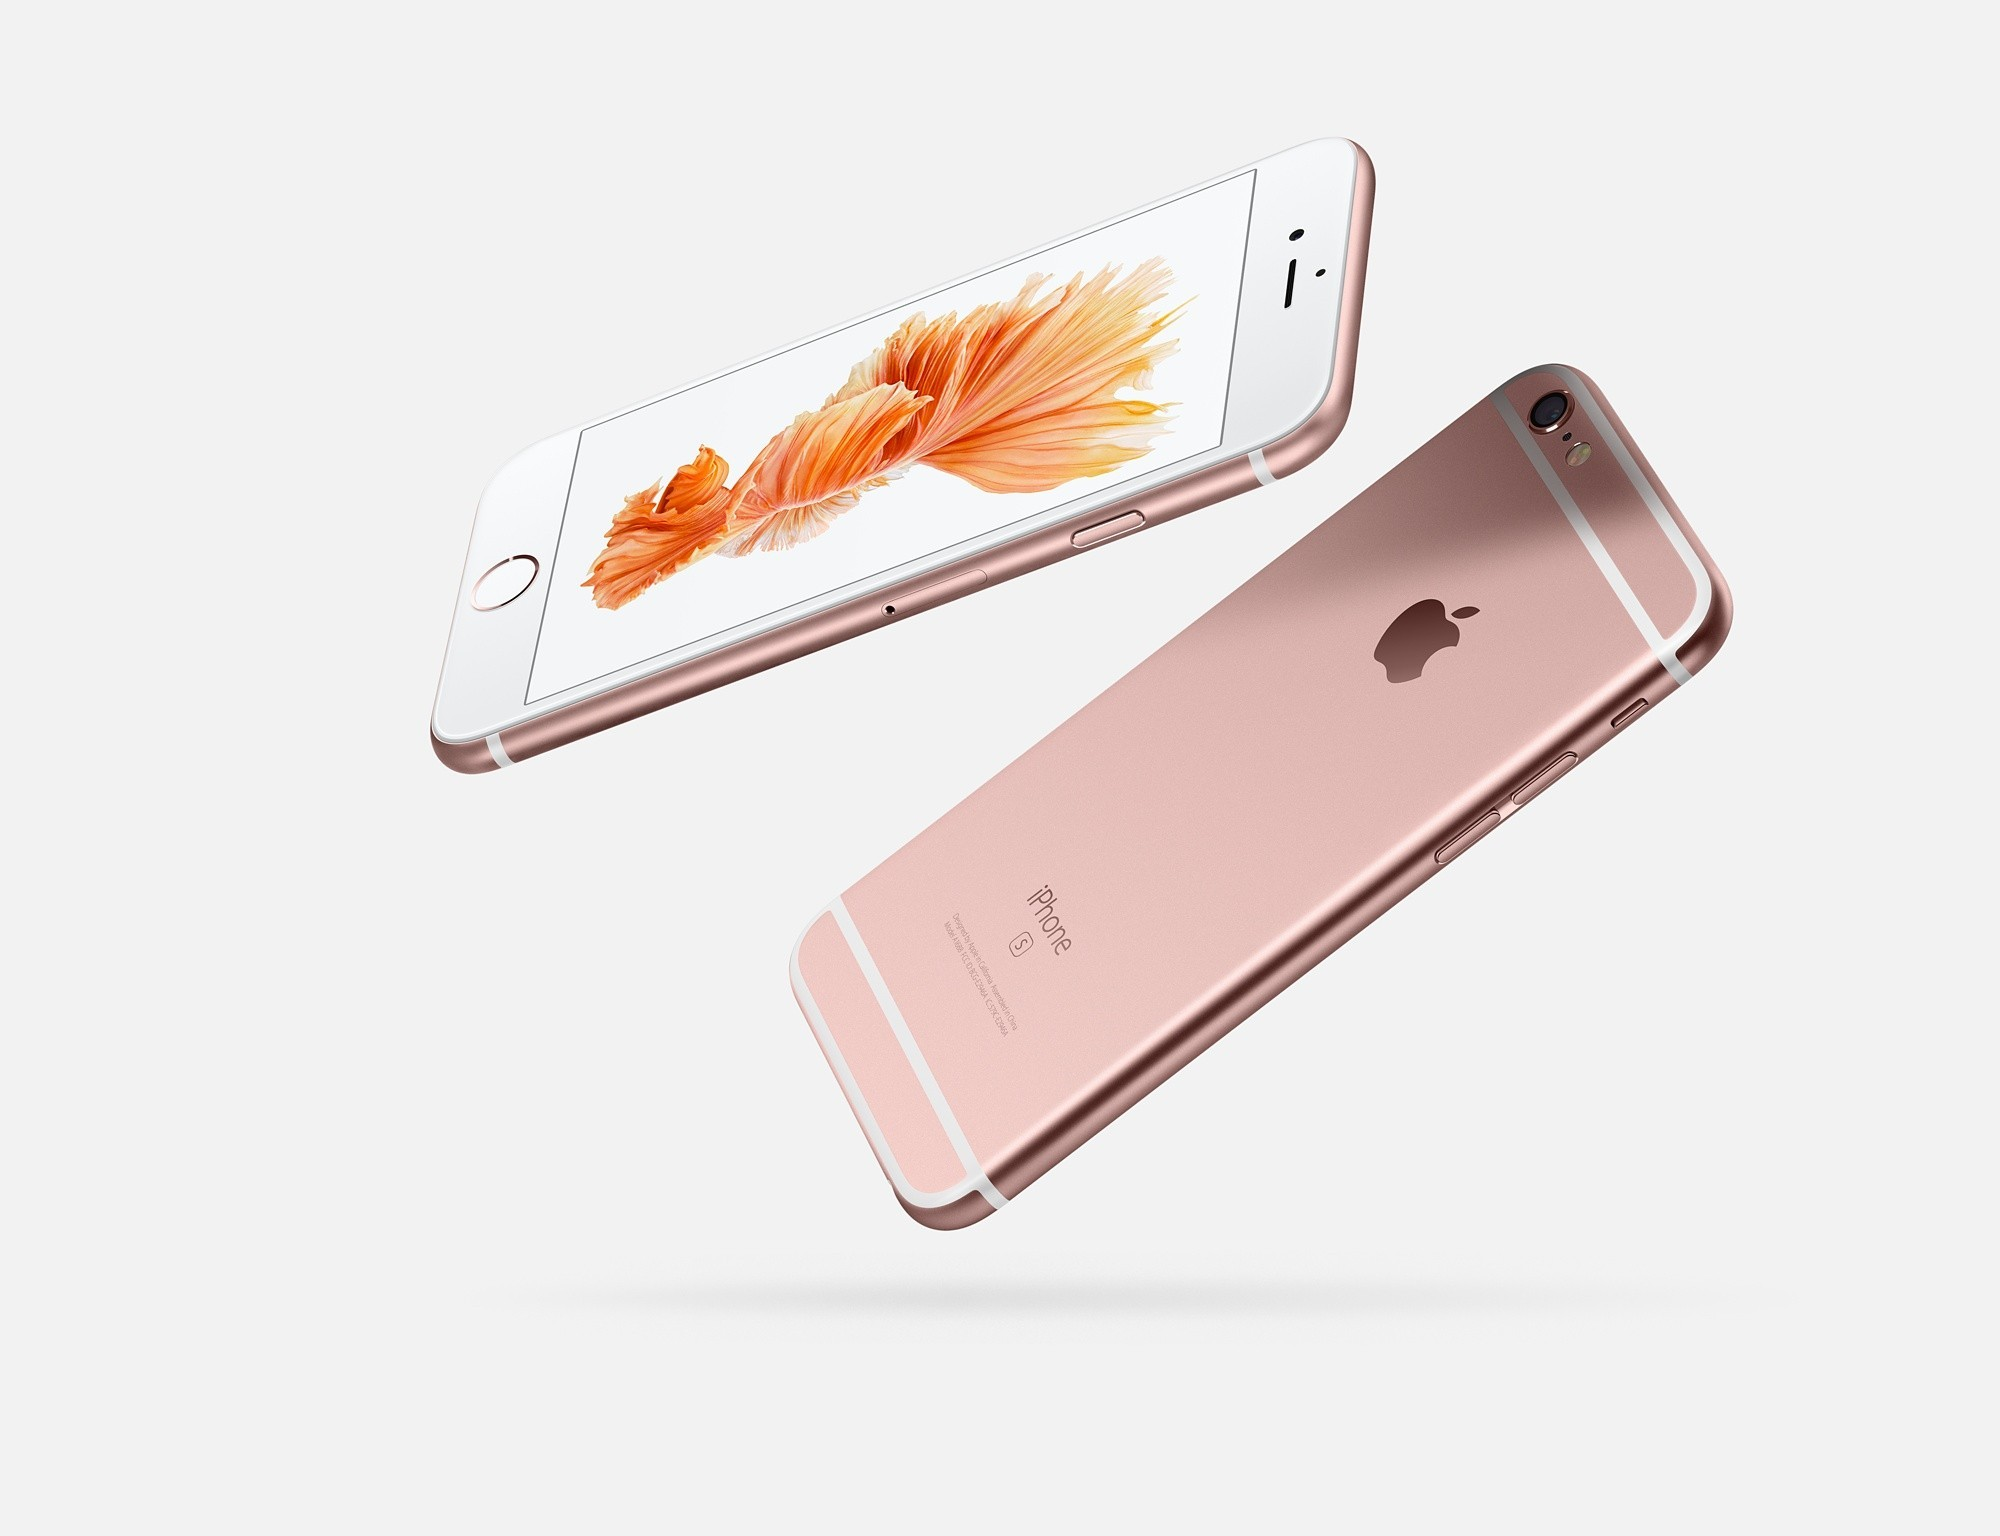 loi-pin-tren-iphone-6s-nghiem-trong-hon-apple-thua-nhan